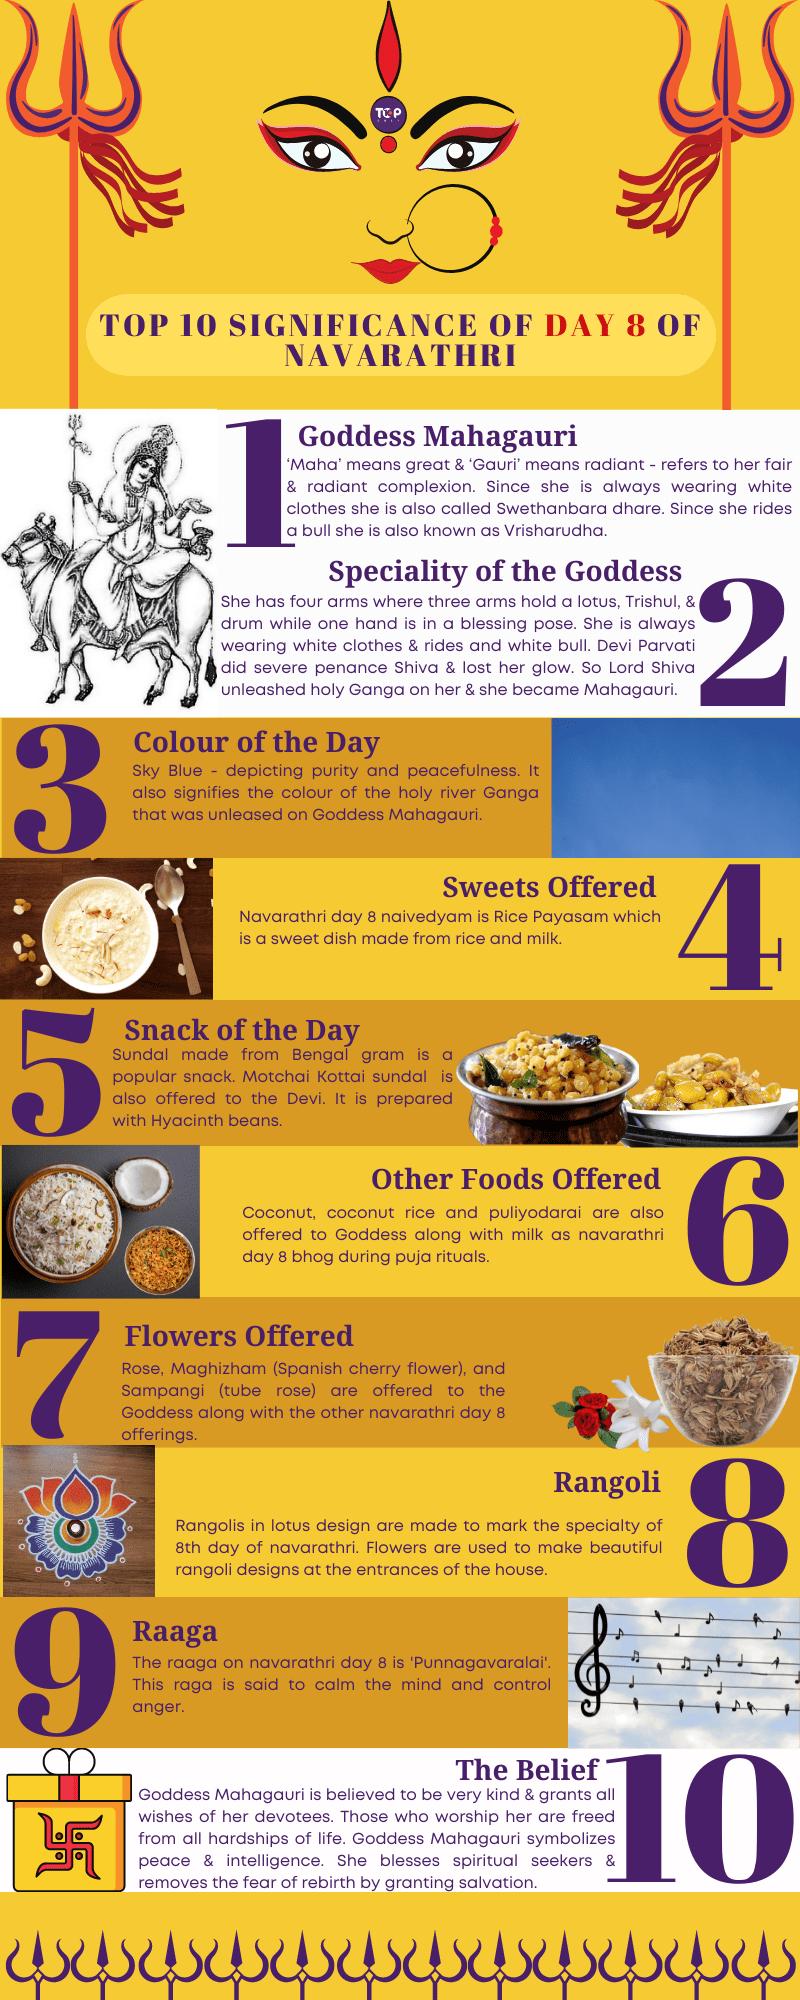 Significance of Day 8 of Navarathri